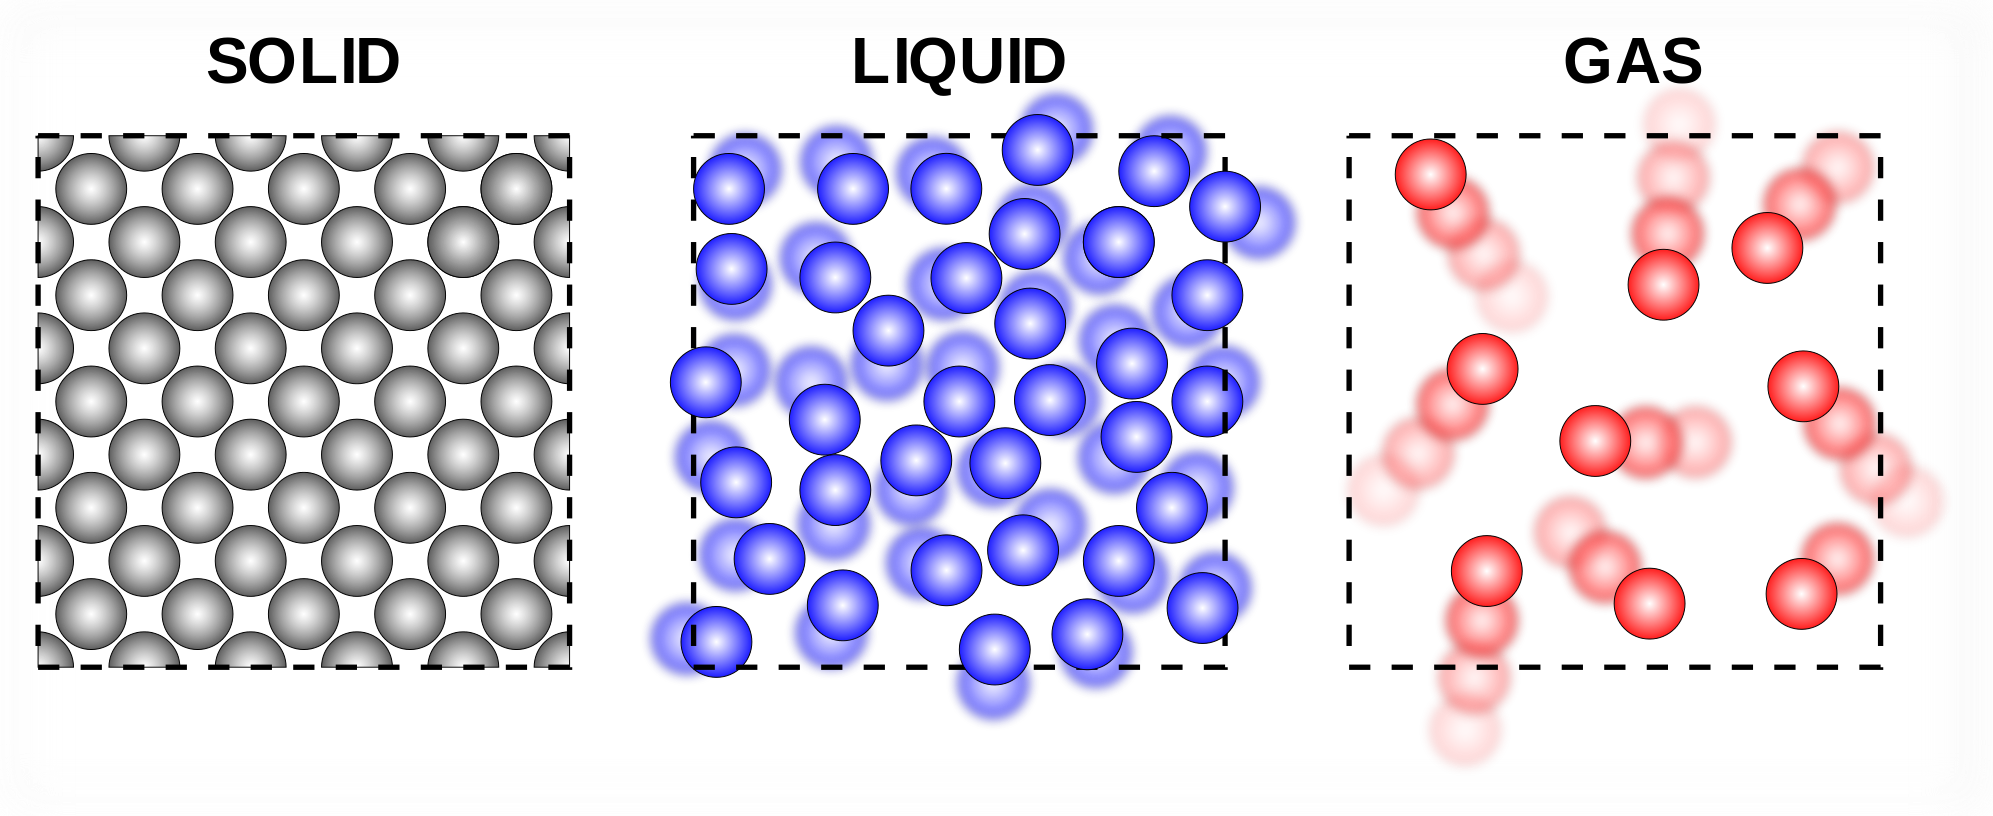 Compressible Flow Regimes | T